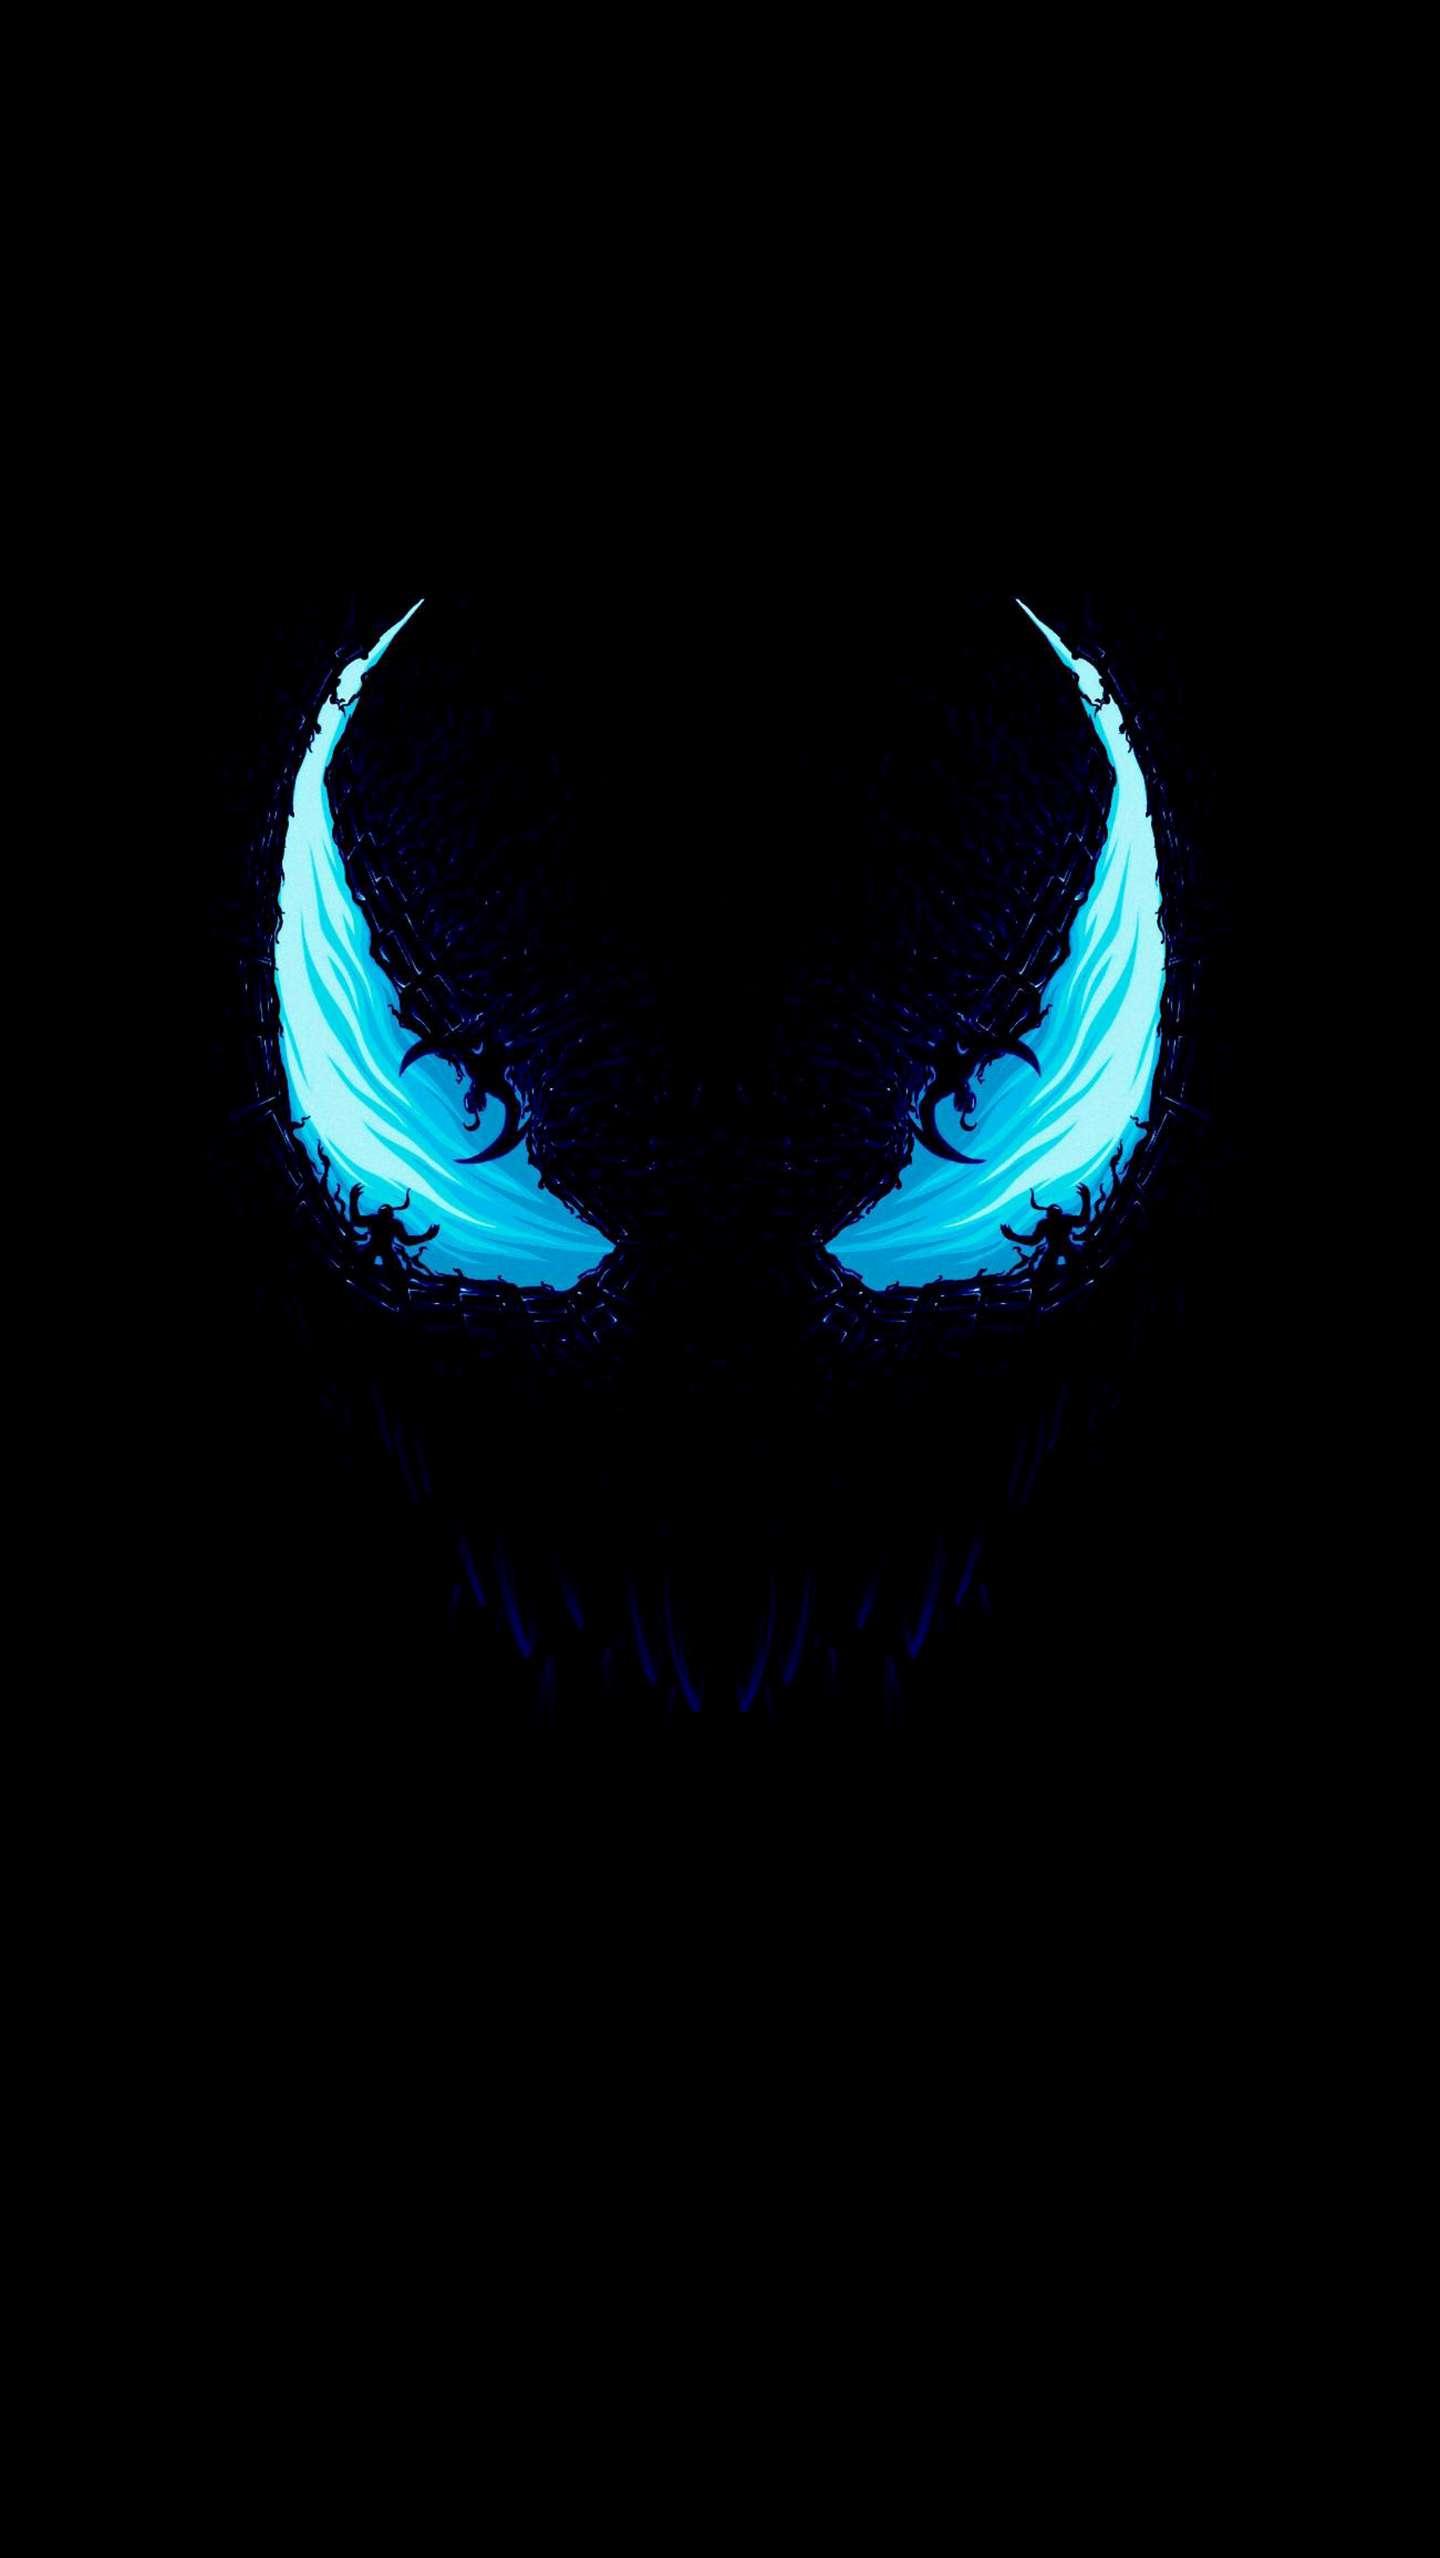 Venom Amoled iPhone Wallpaper